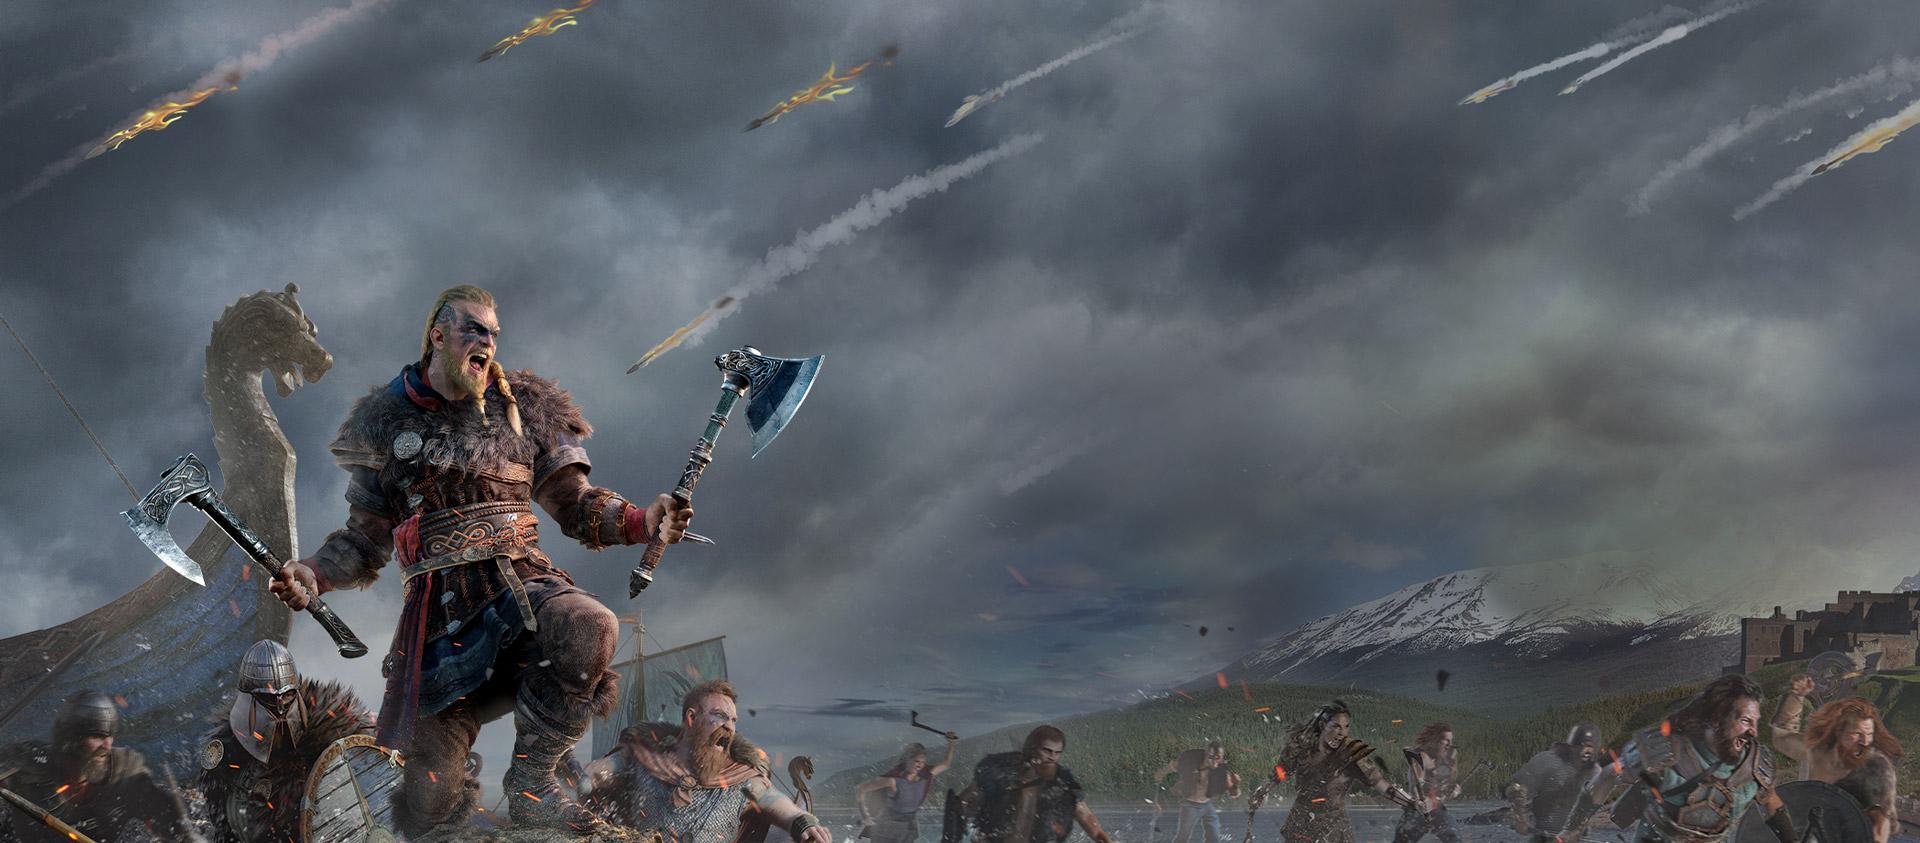 Assassin's Creed Valhalla: Une grande traversée humaine